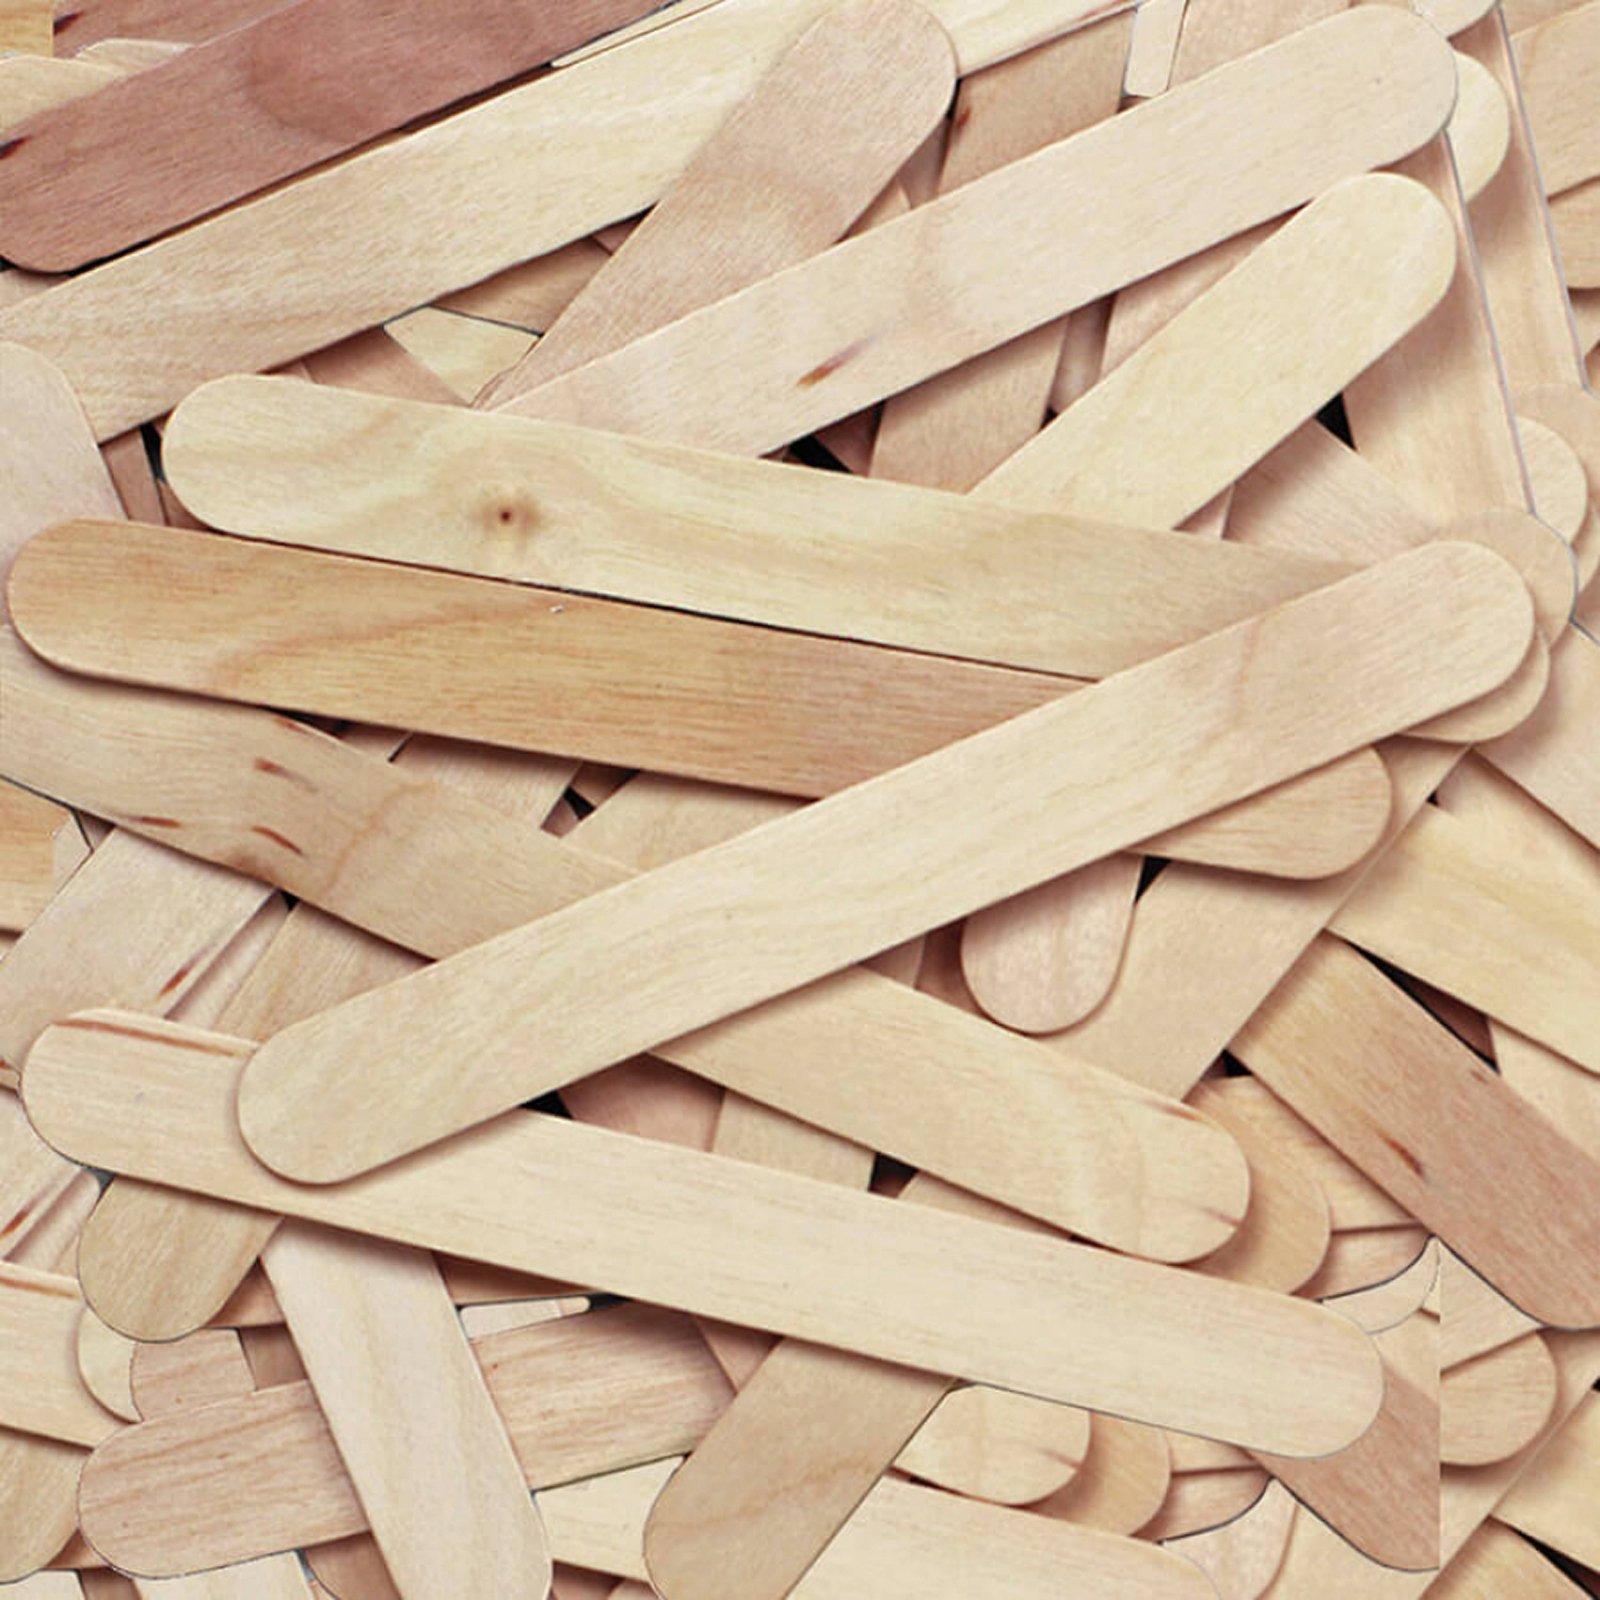 Creativity Street Jumbo Craft Sticks, Natural, 6'' x 0.75'', 500 Per Pack, 2 Packs